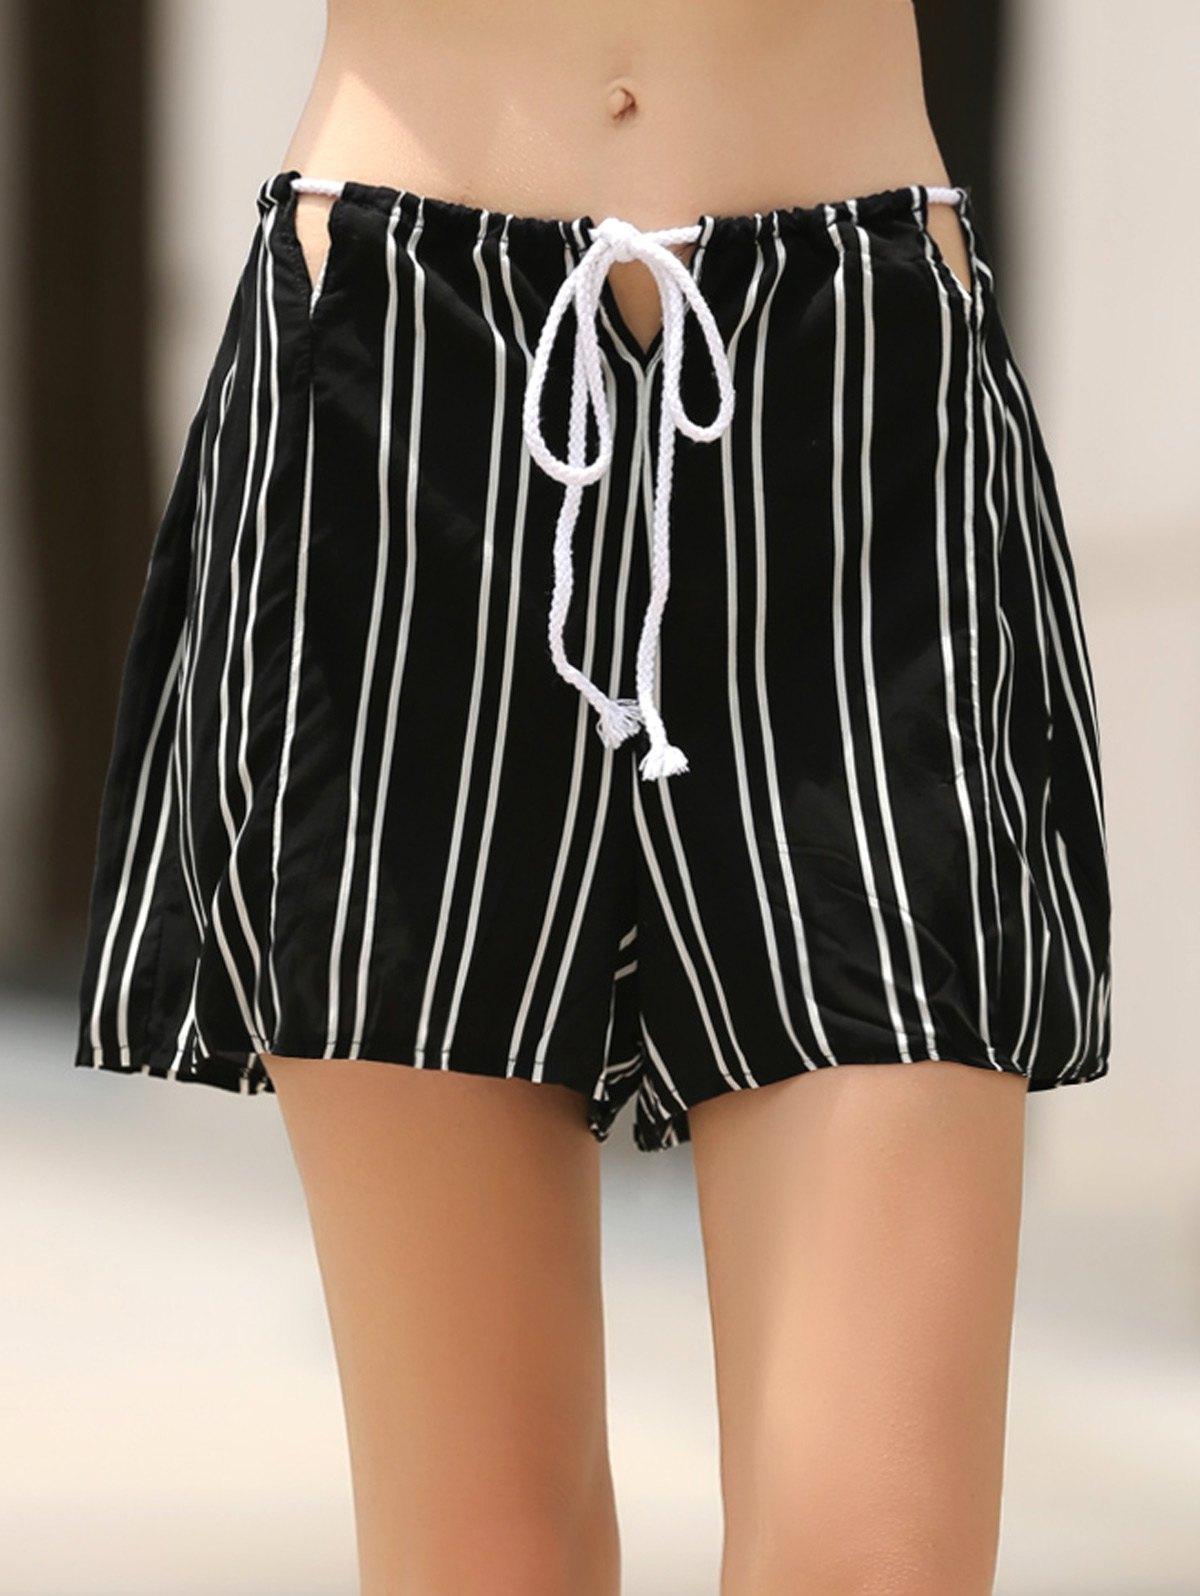 High Waist Loose Stripes Cut Out Shorts